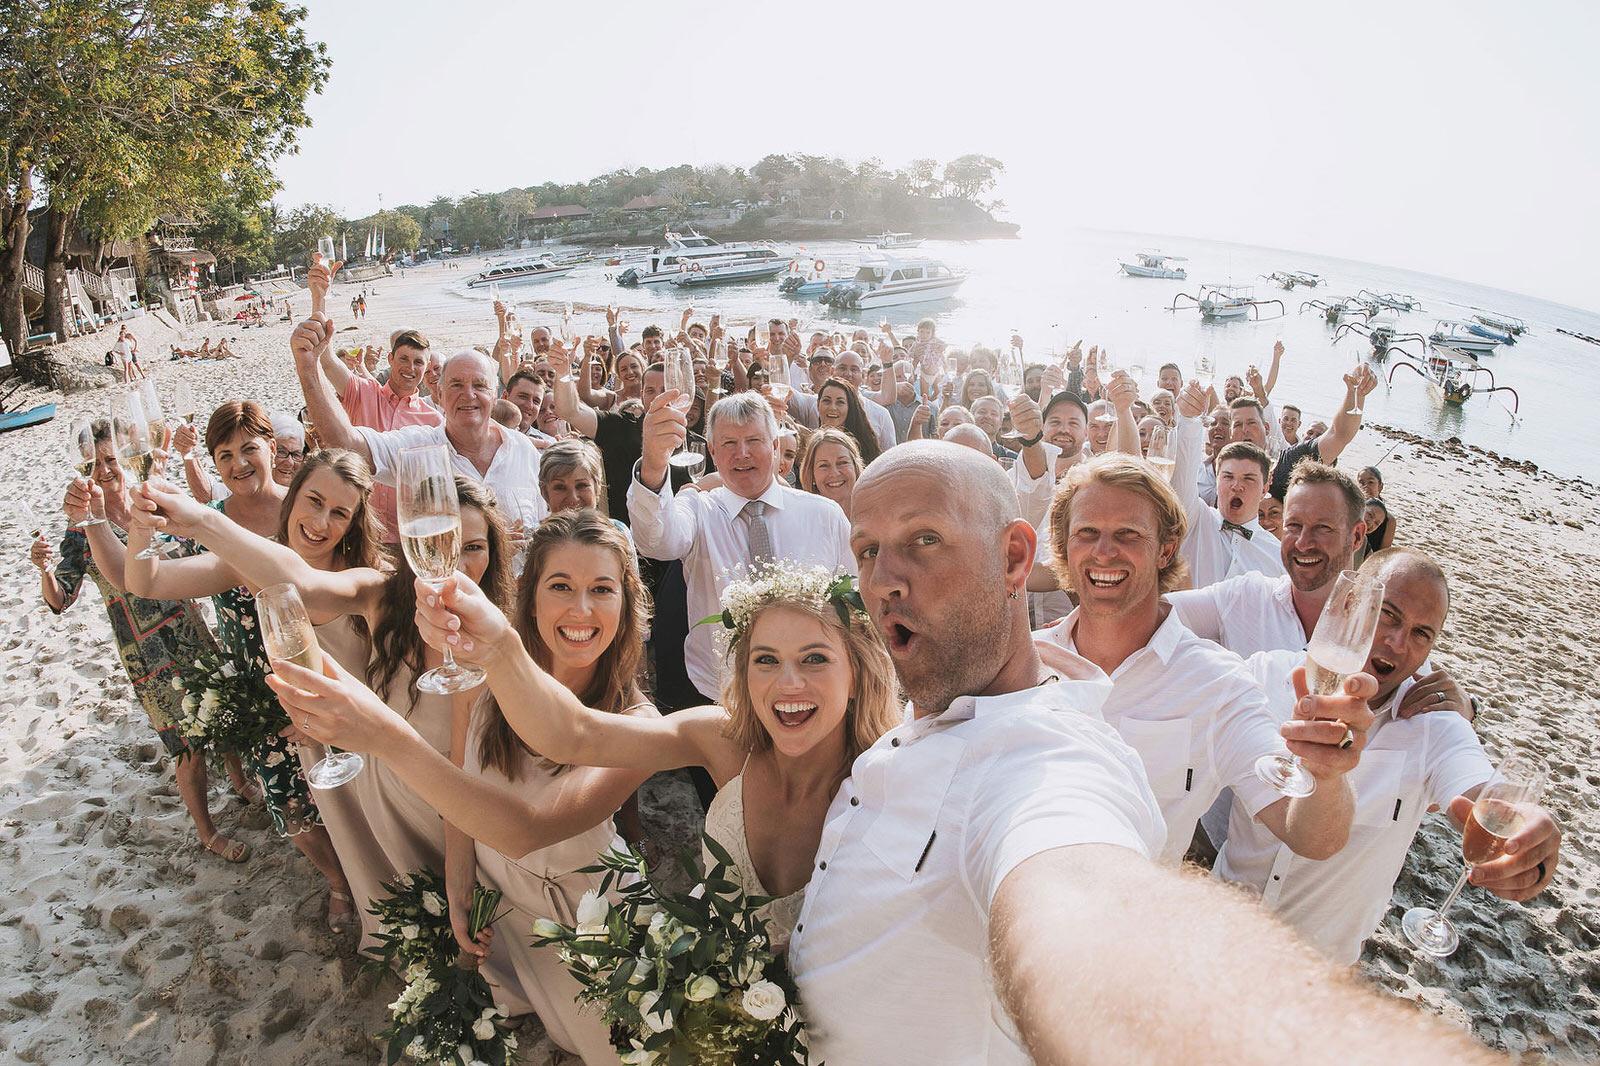 newfound-hai-tide-nusa-lembongan-bali-wedding-photographers-127